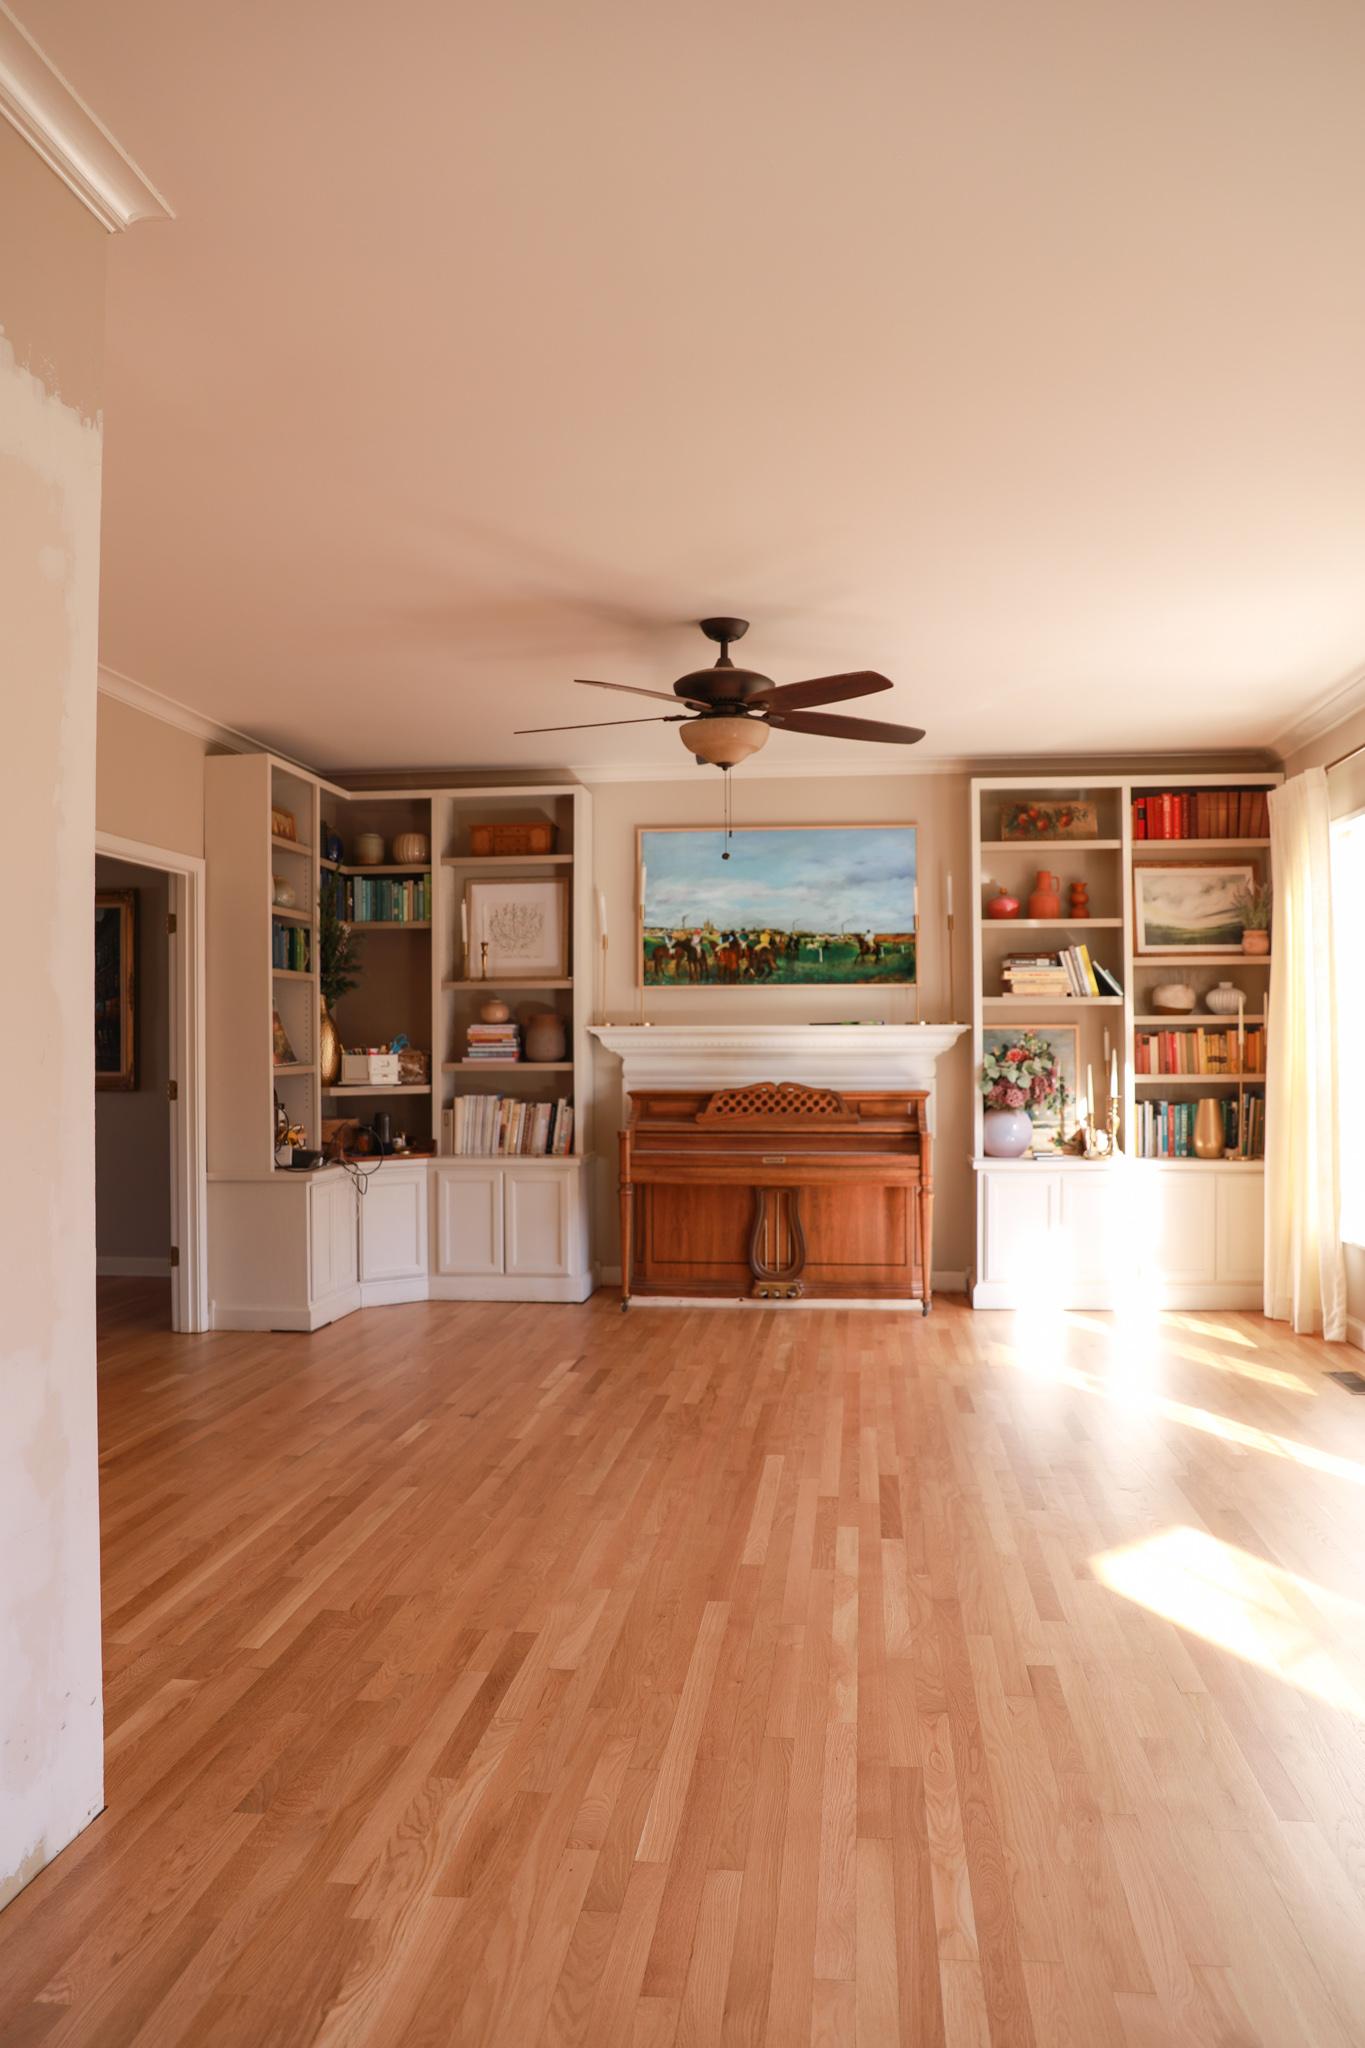 White oak flooring - resurfacing floors